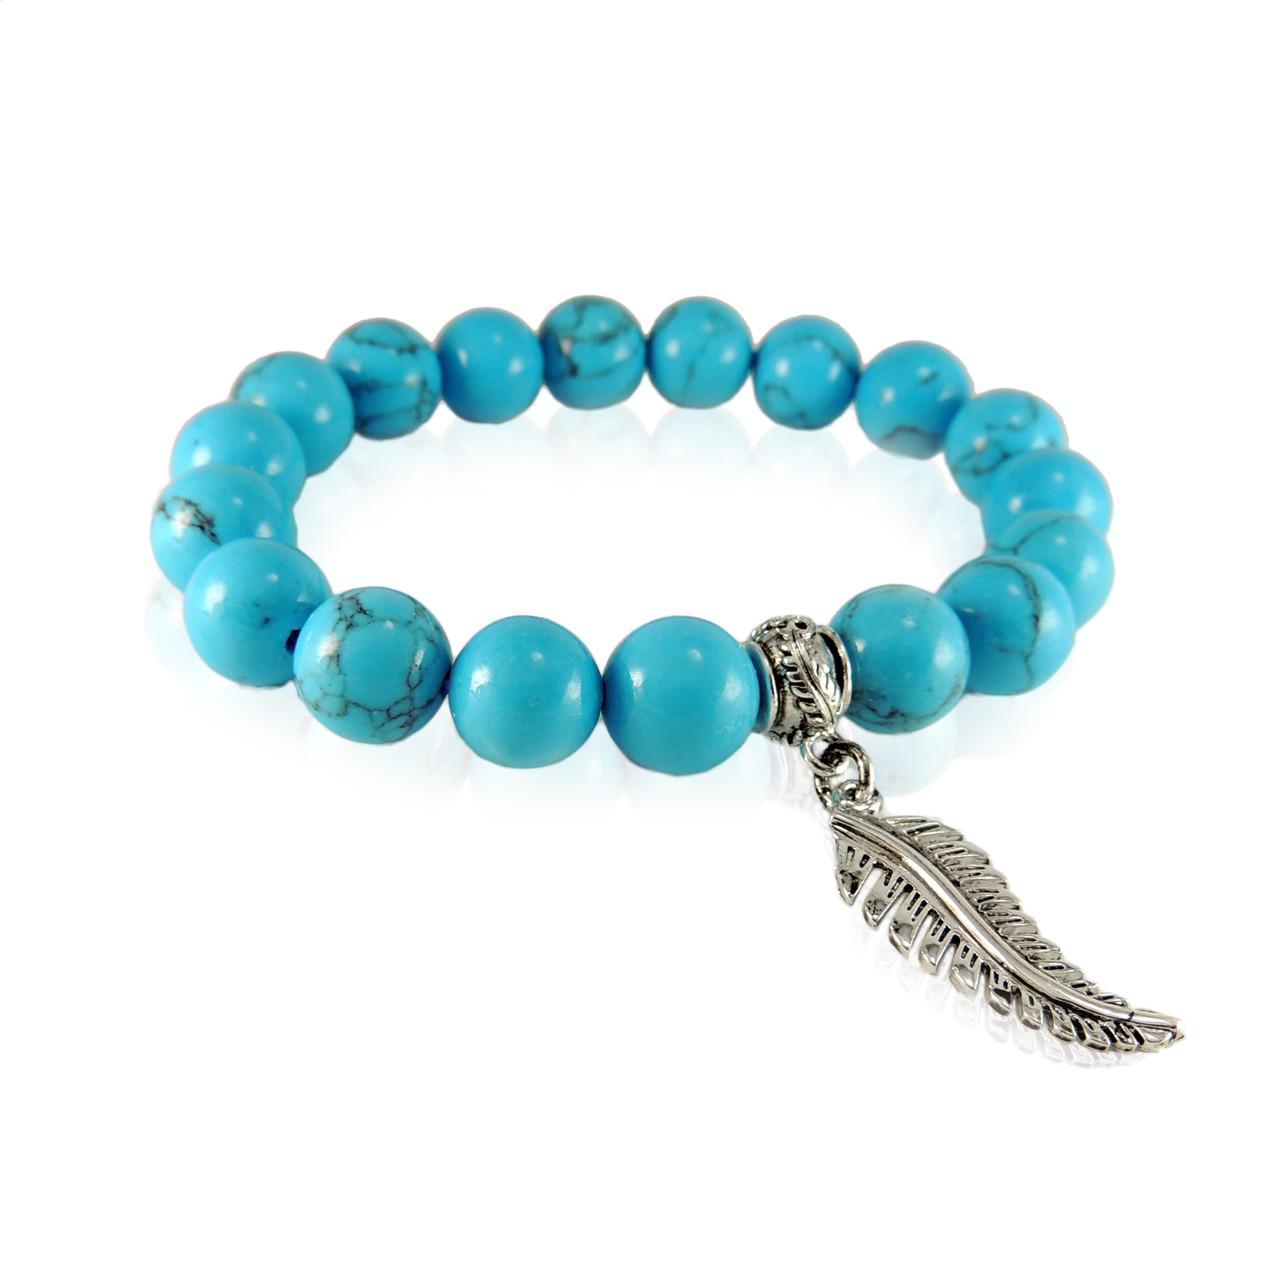 GBTQ-KGB12tq Turquoise Howlite Bracelet with Silver Fern Charm